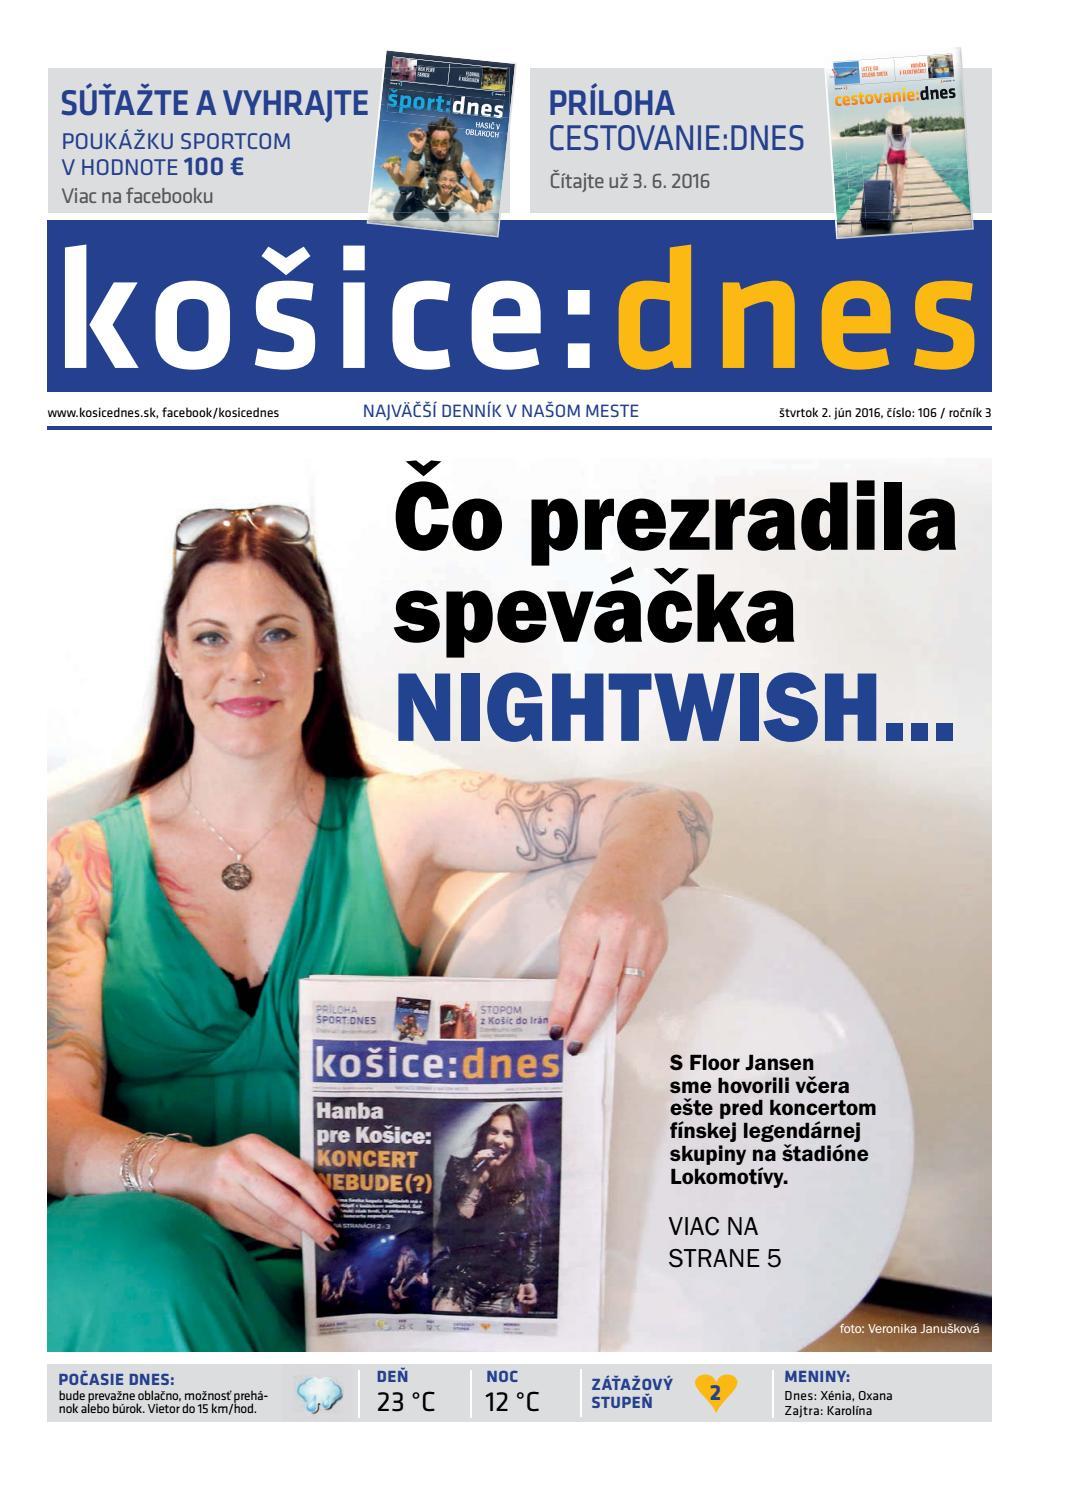 e8b4909e63 košice dnes 2.6.2016 by KOŠICE DNES - issuu